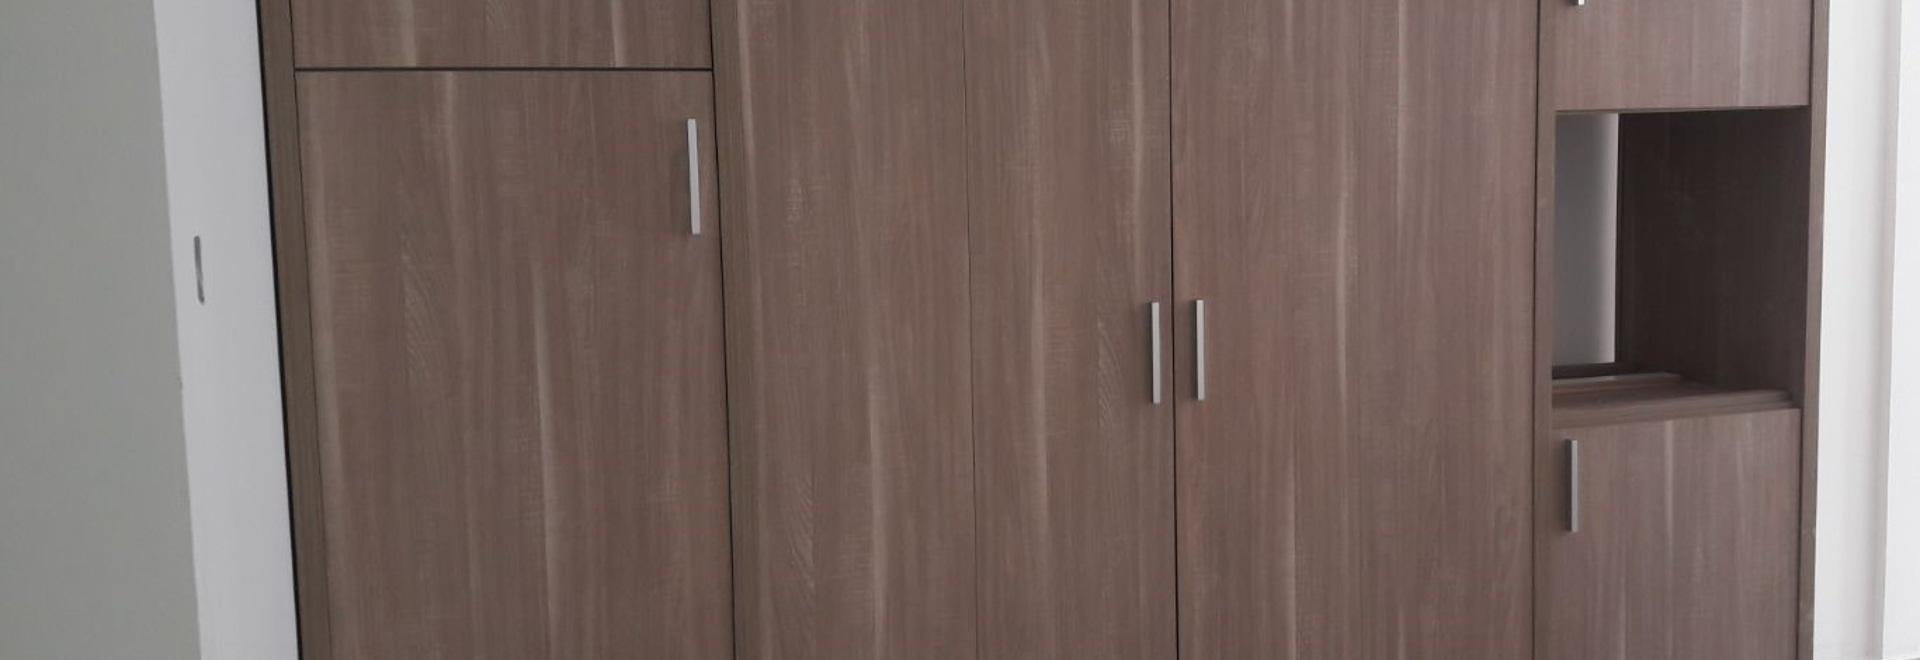 Installiert 105 Miniküchen am Shamal-Wohnsitz-Gebäude in Dubai